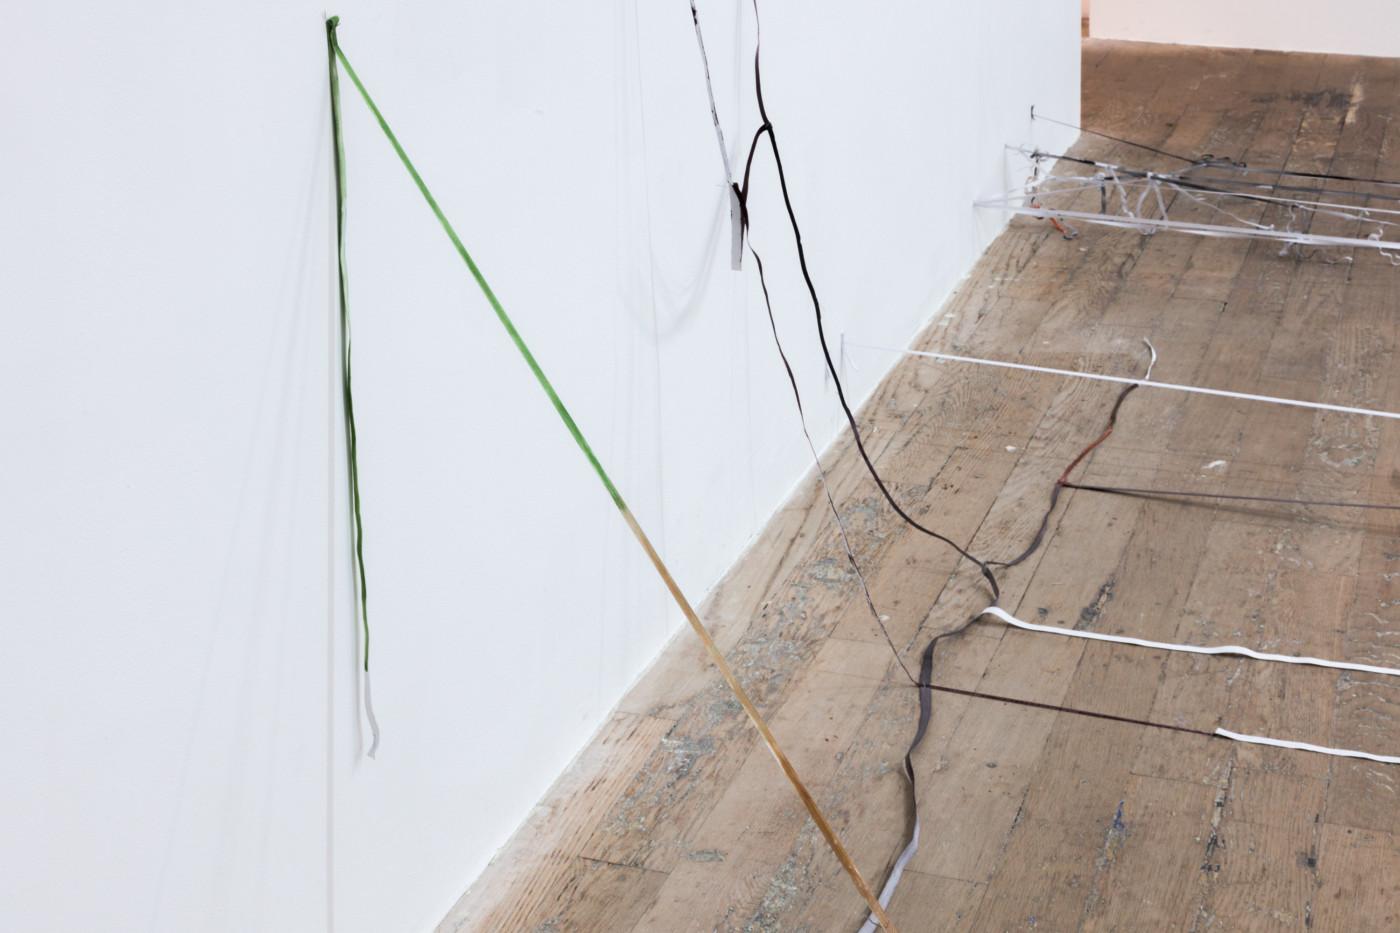 OLGA BALEMA  11,  2019 Elastic band, paint, glue, nails, staples 95,25 x 114,3 x 100,33 cm / 37 1/2 x 44 7/8 x 39 3/8 in - High Art Gallery Paris